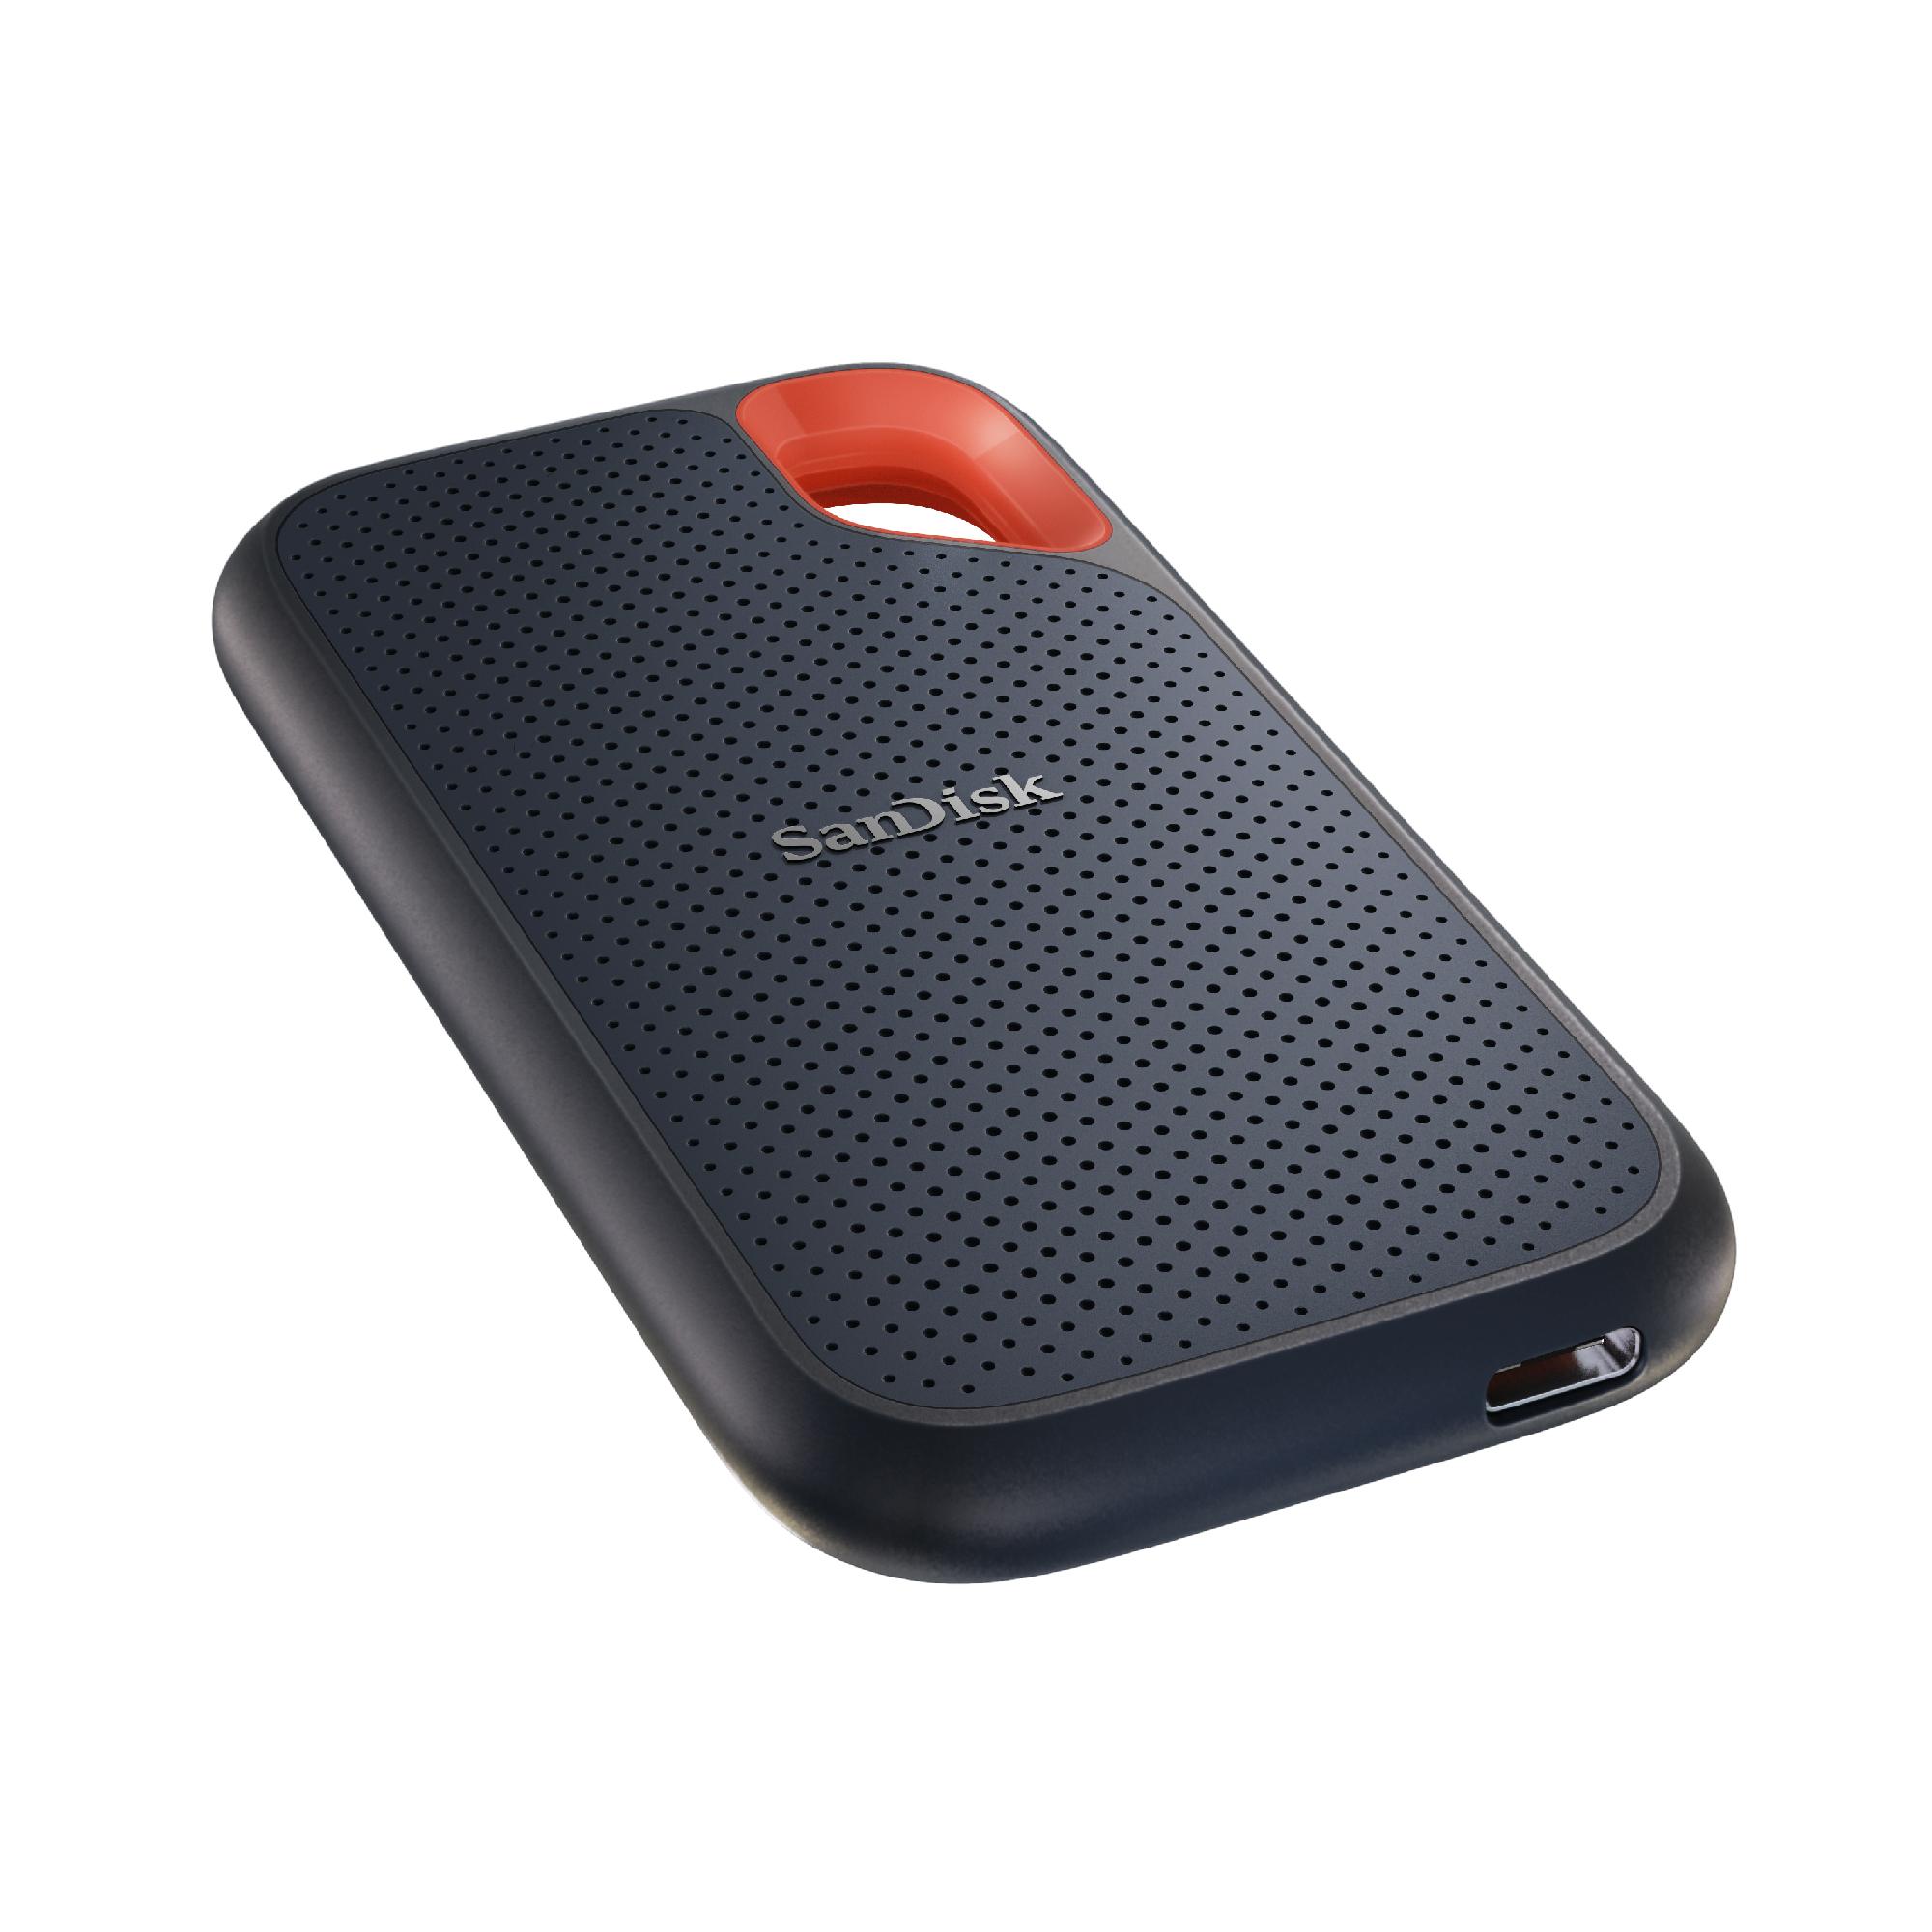 SanDisk Extreme Portable SSD 500GB V2